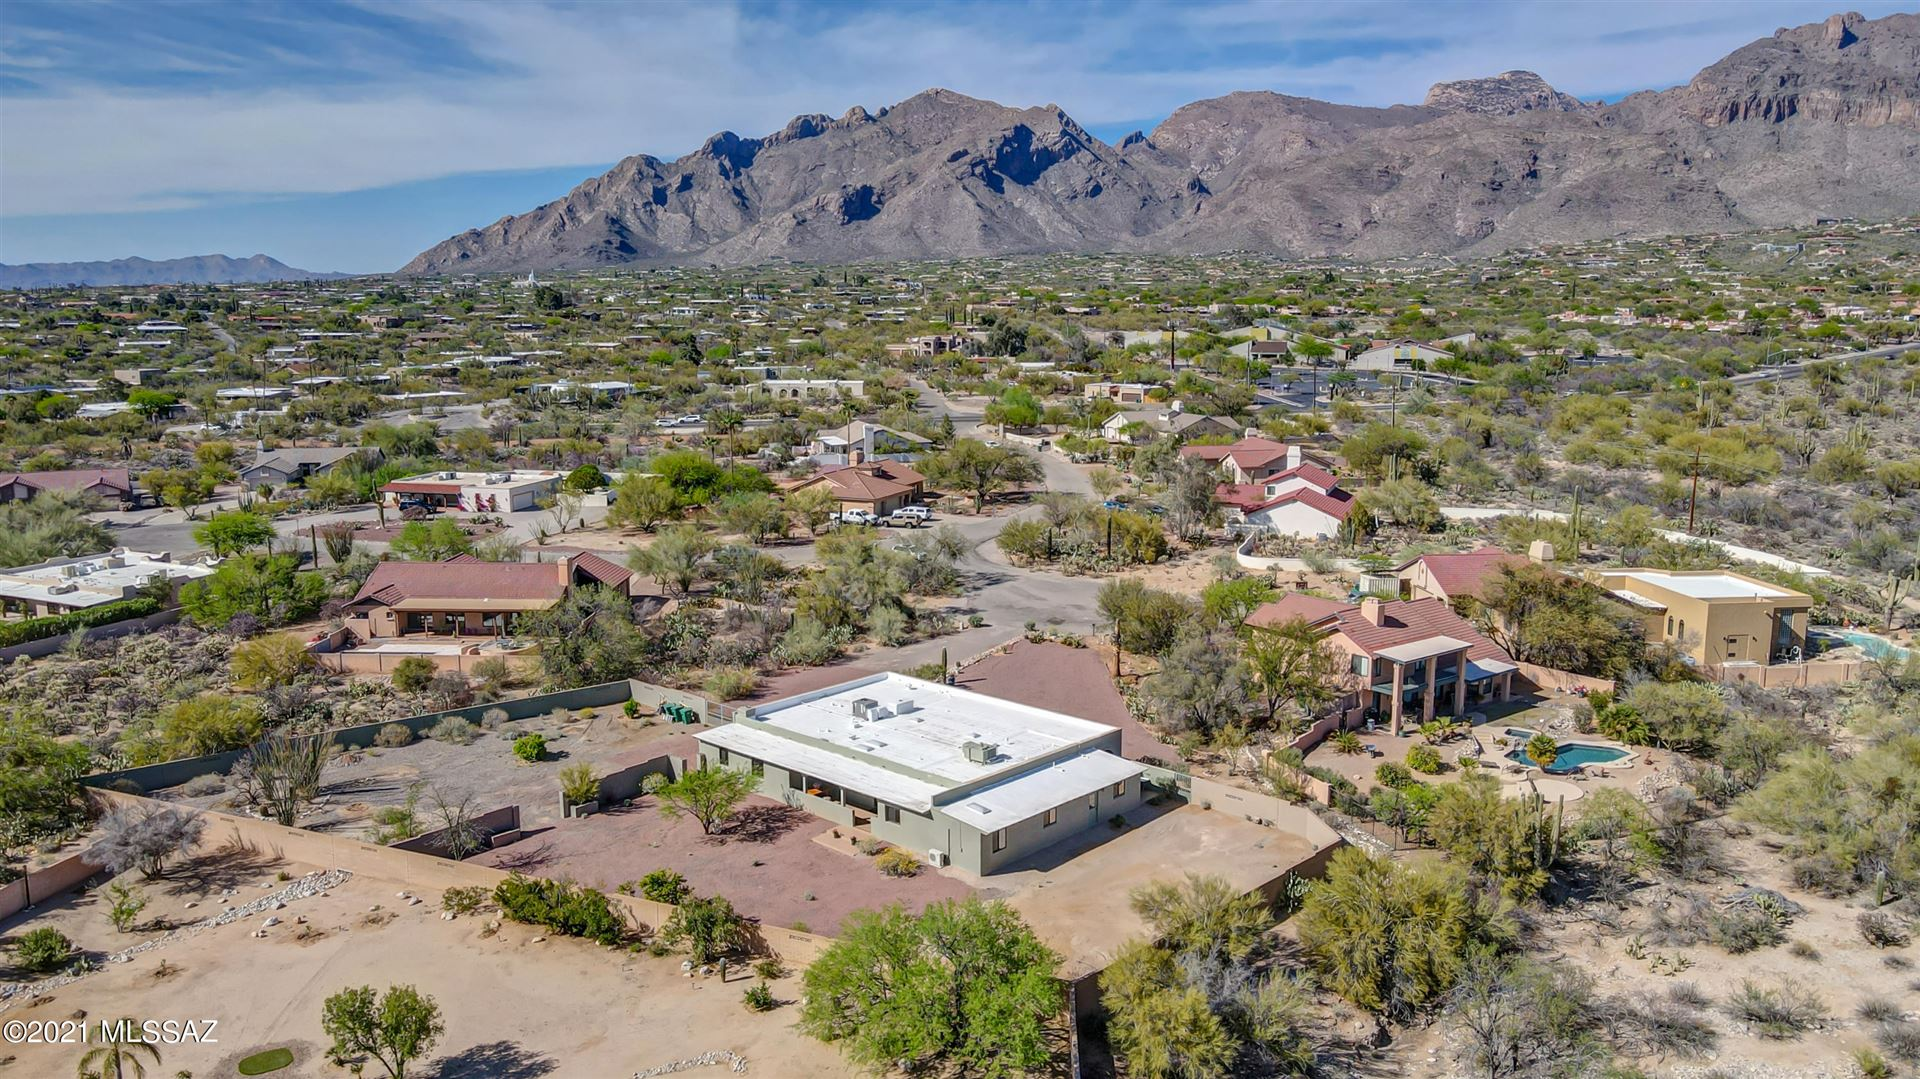 6368 N Camino Padre Isidoro, Tucson, AZ 85718 - MLS#: 22109325